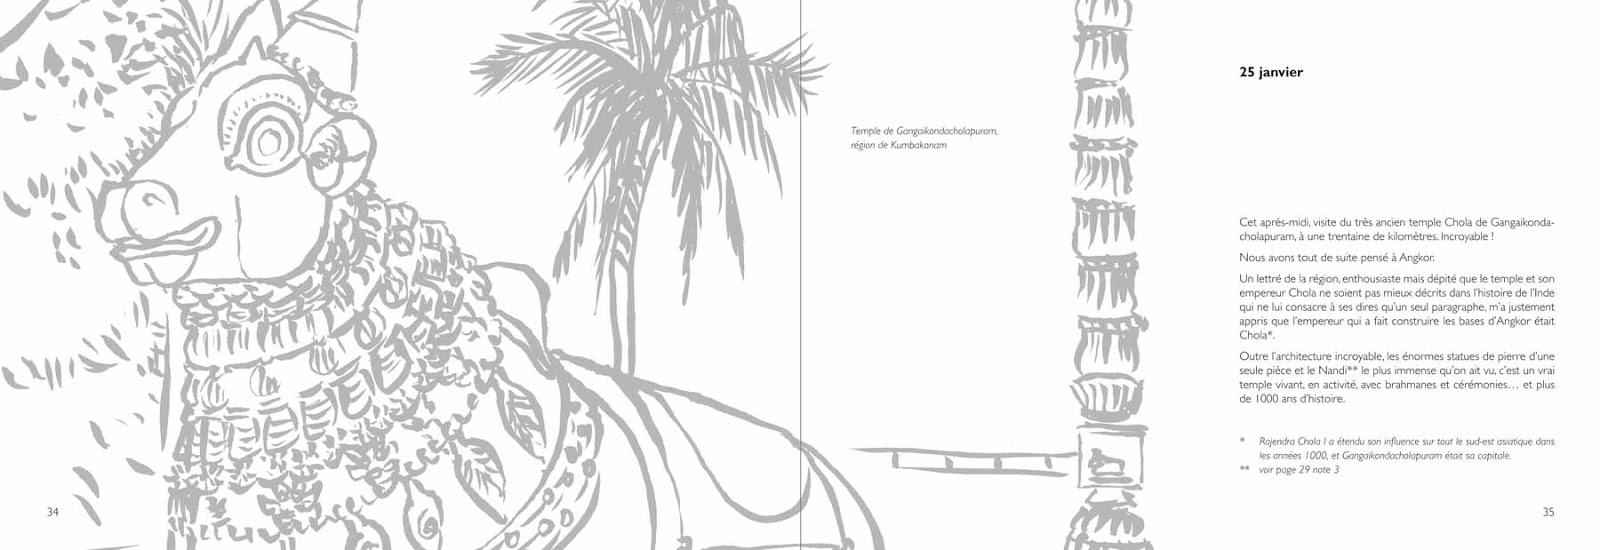 Carnet de voyage en Inde - Annik Reymond Michel Lizot 34-35